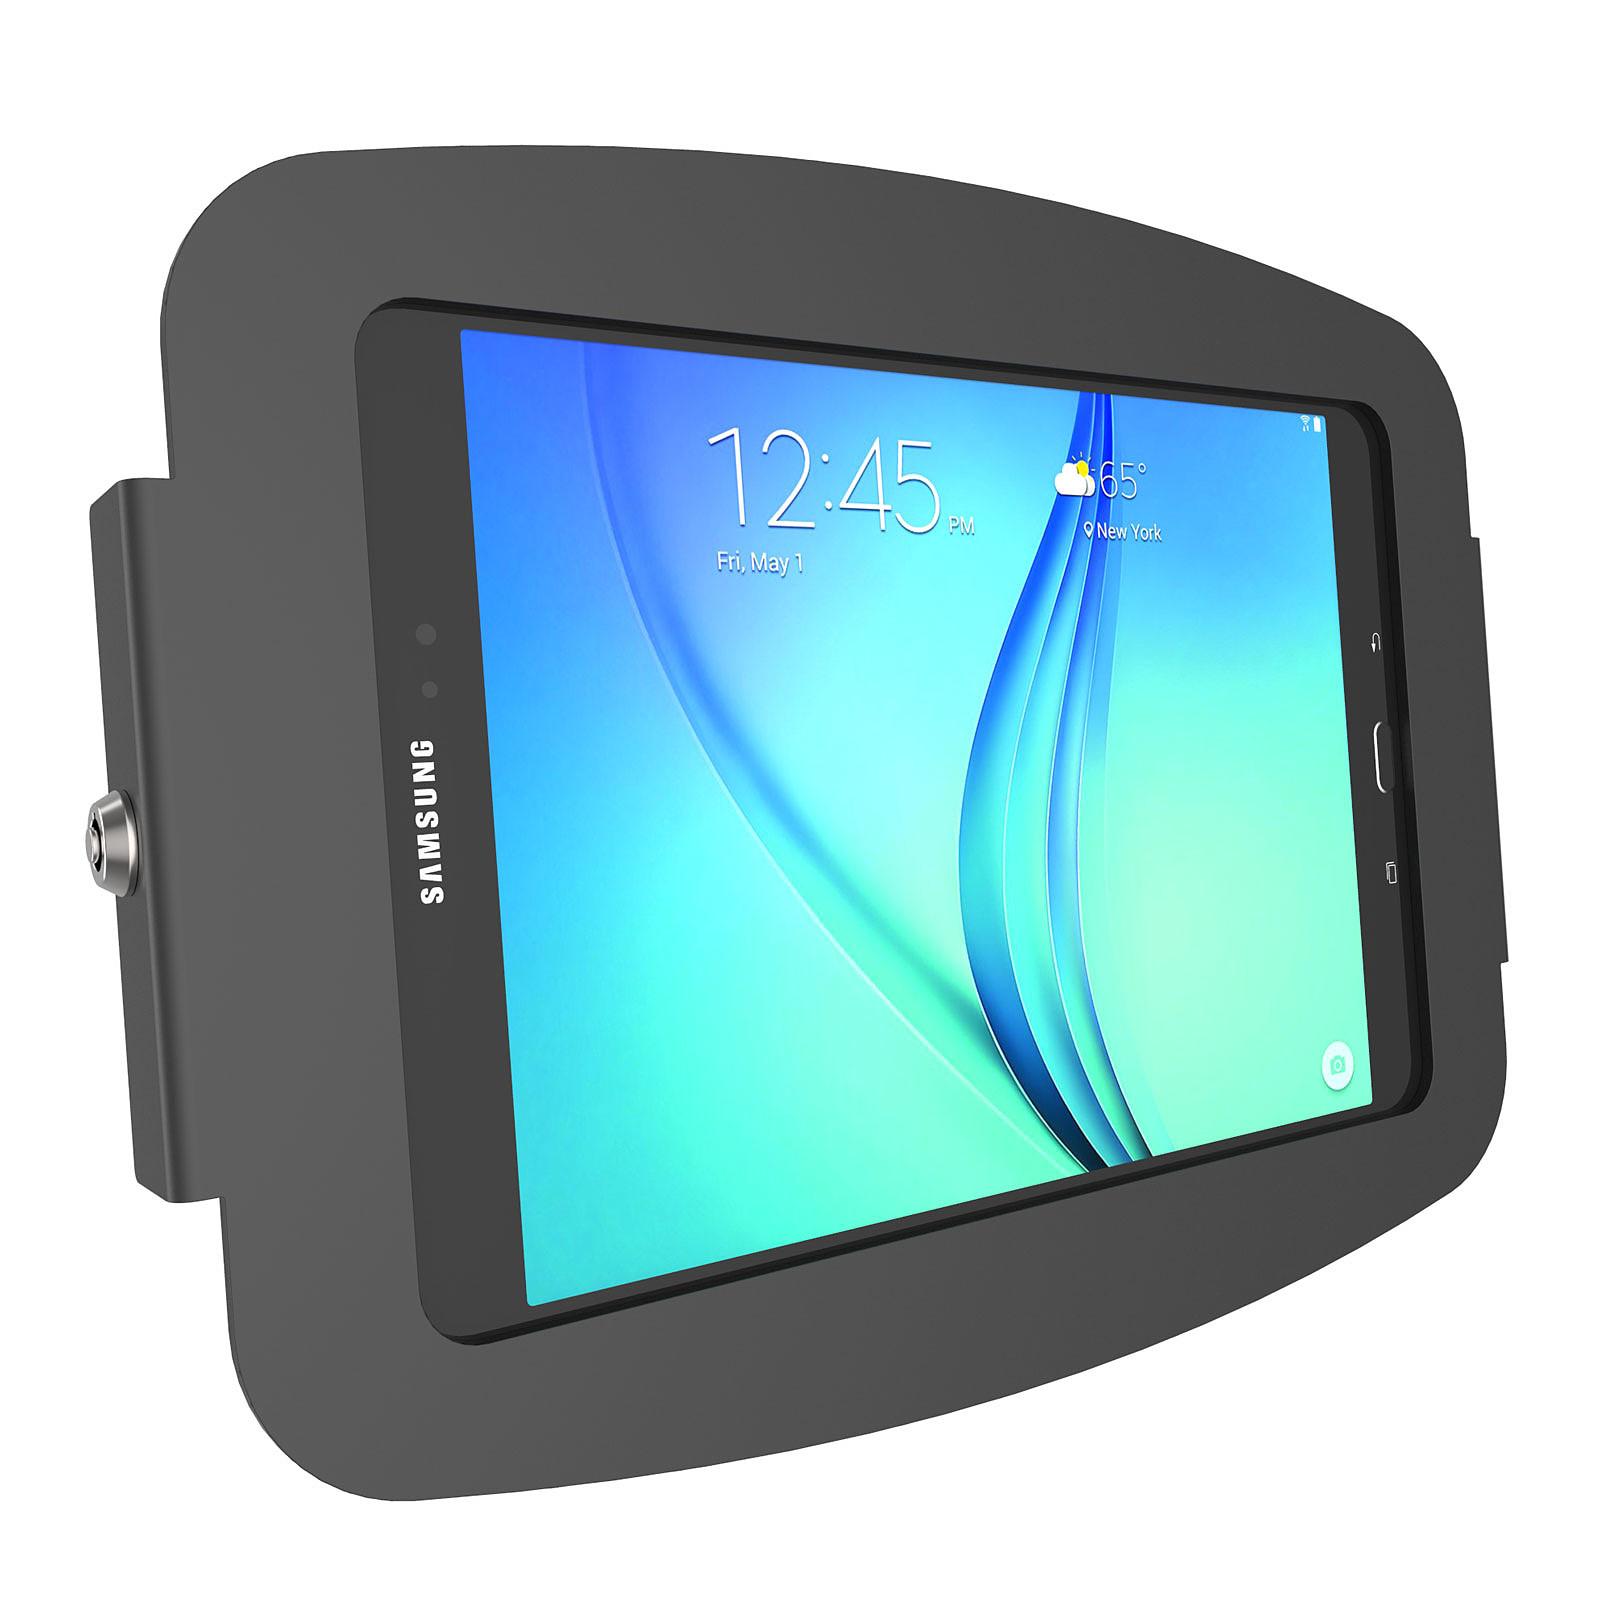 24e359dc98c Maclocks Space Galaxy Tab A 10.1 Tablet Enclosure Wall Mount Noir ...